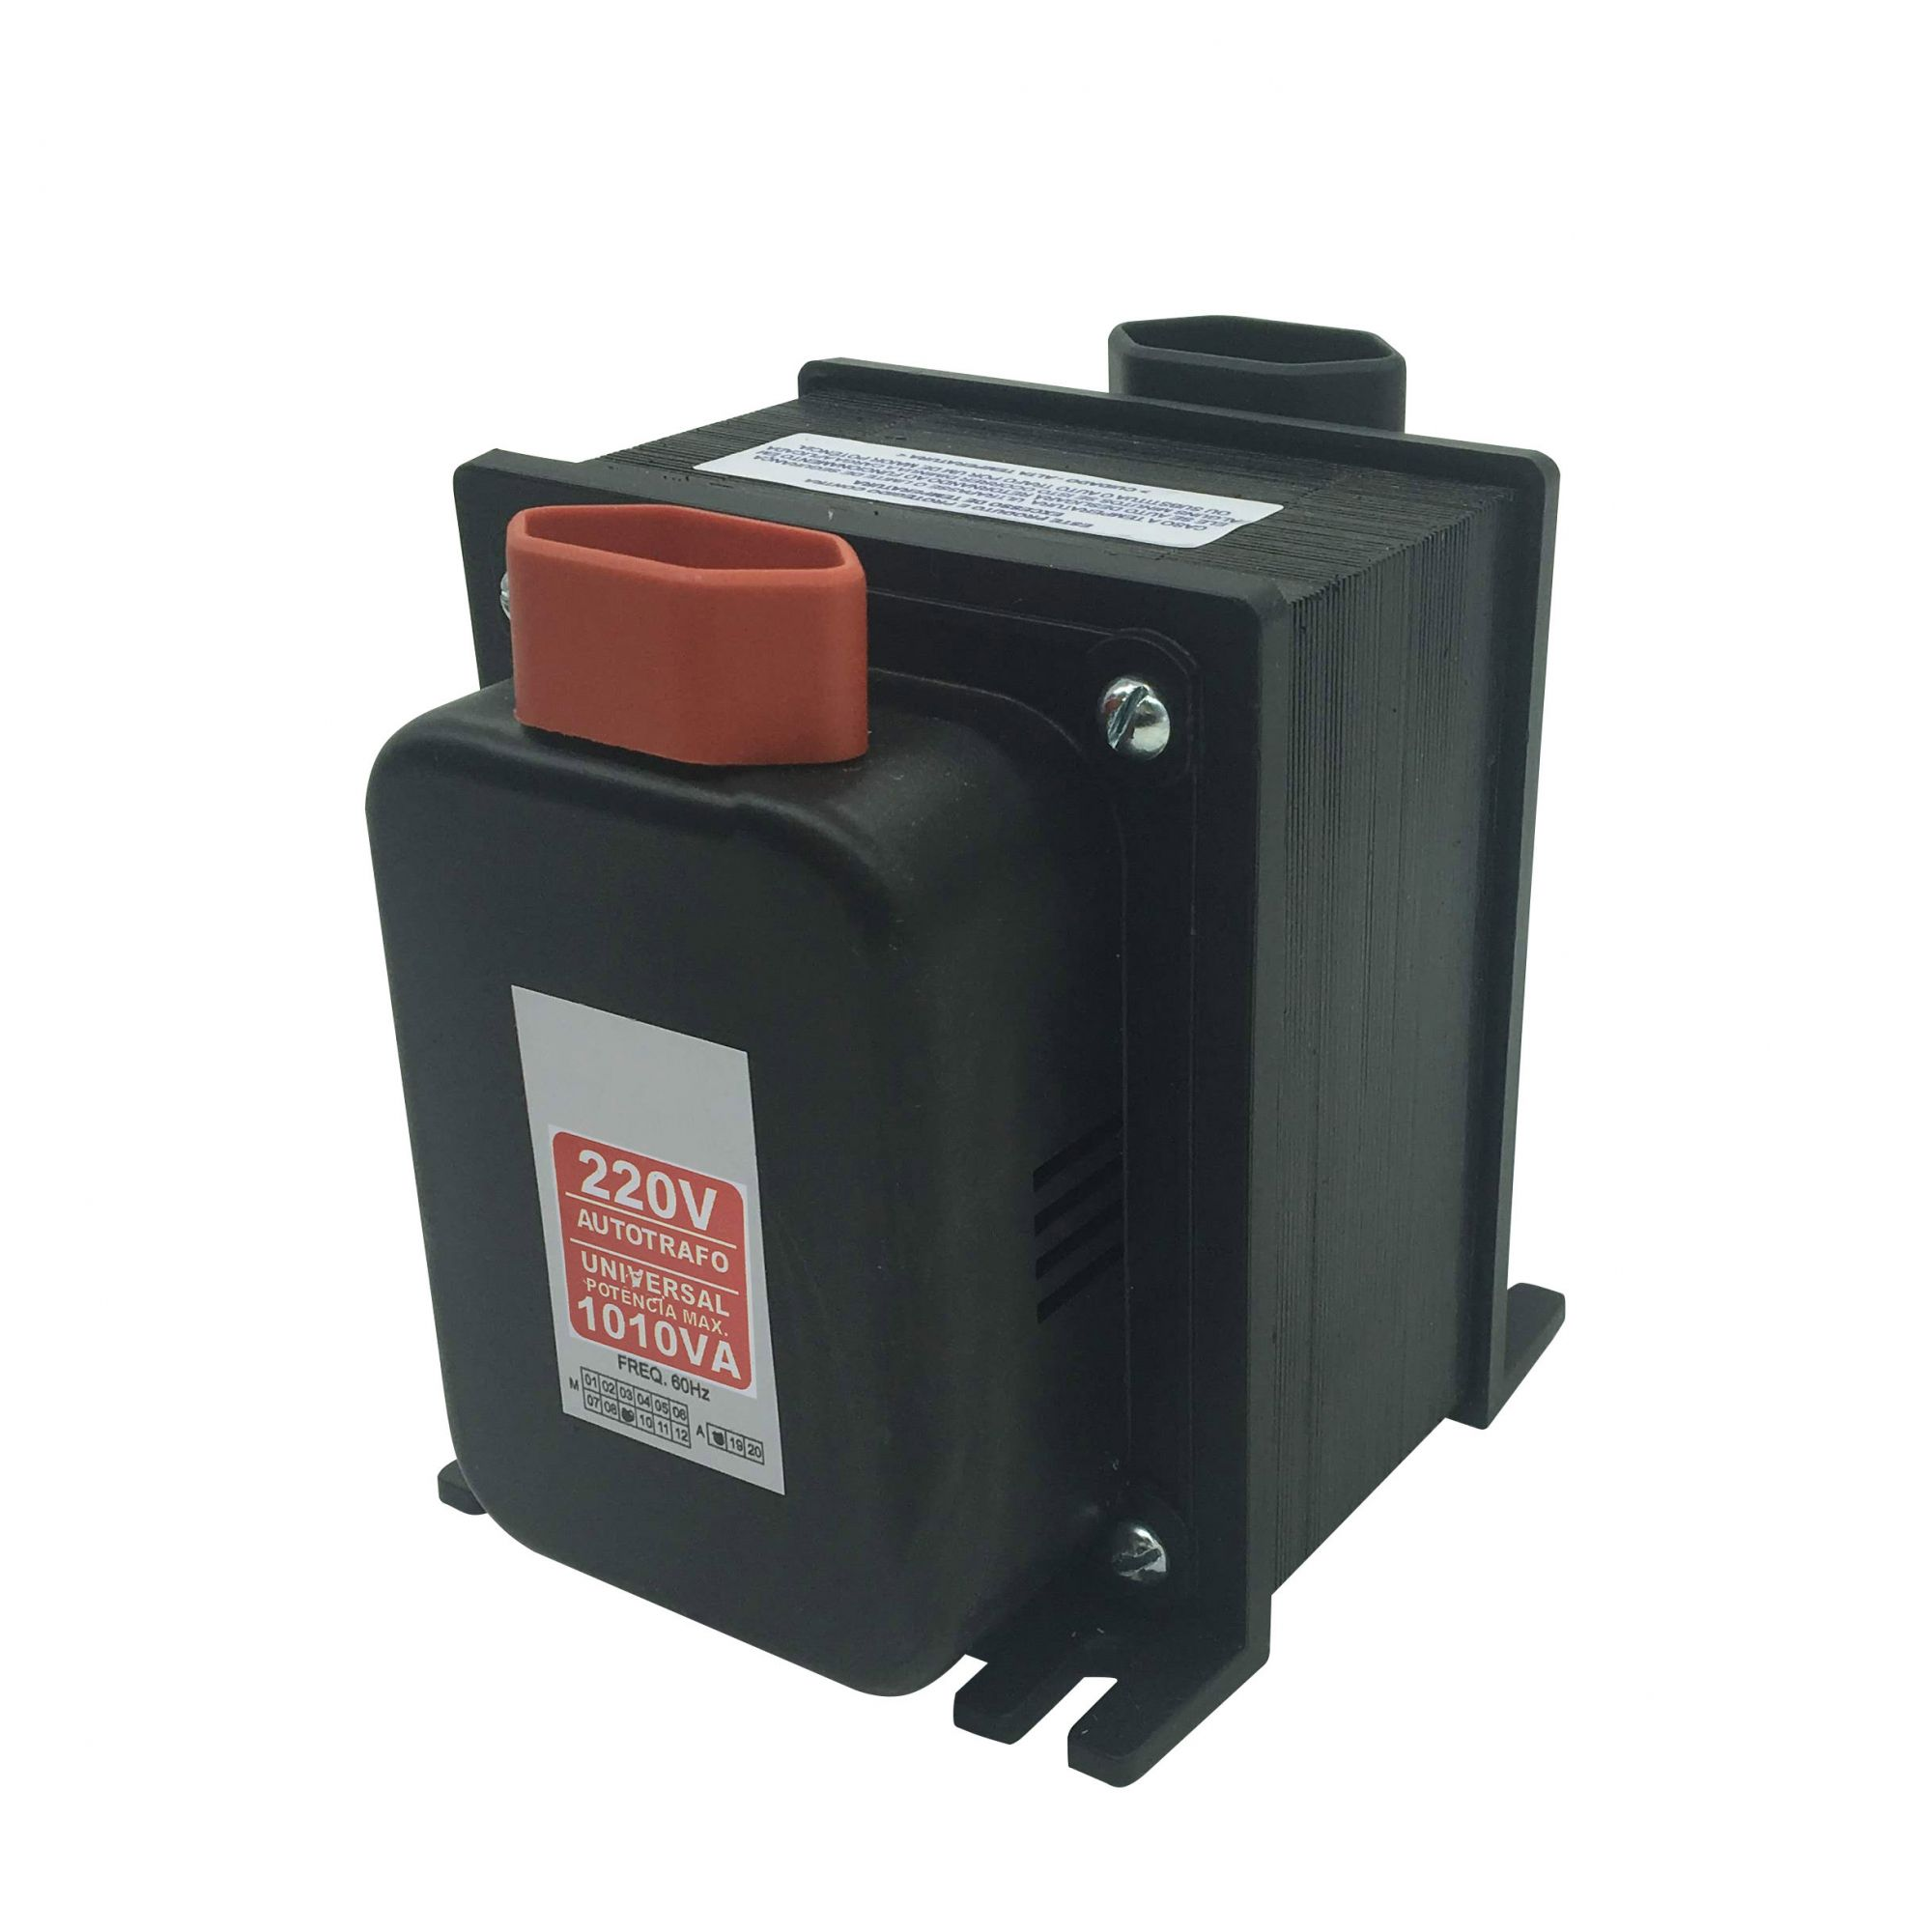 Autotransformador Automático 1000VA 110/220 220/110 - (Bivolt)